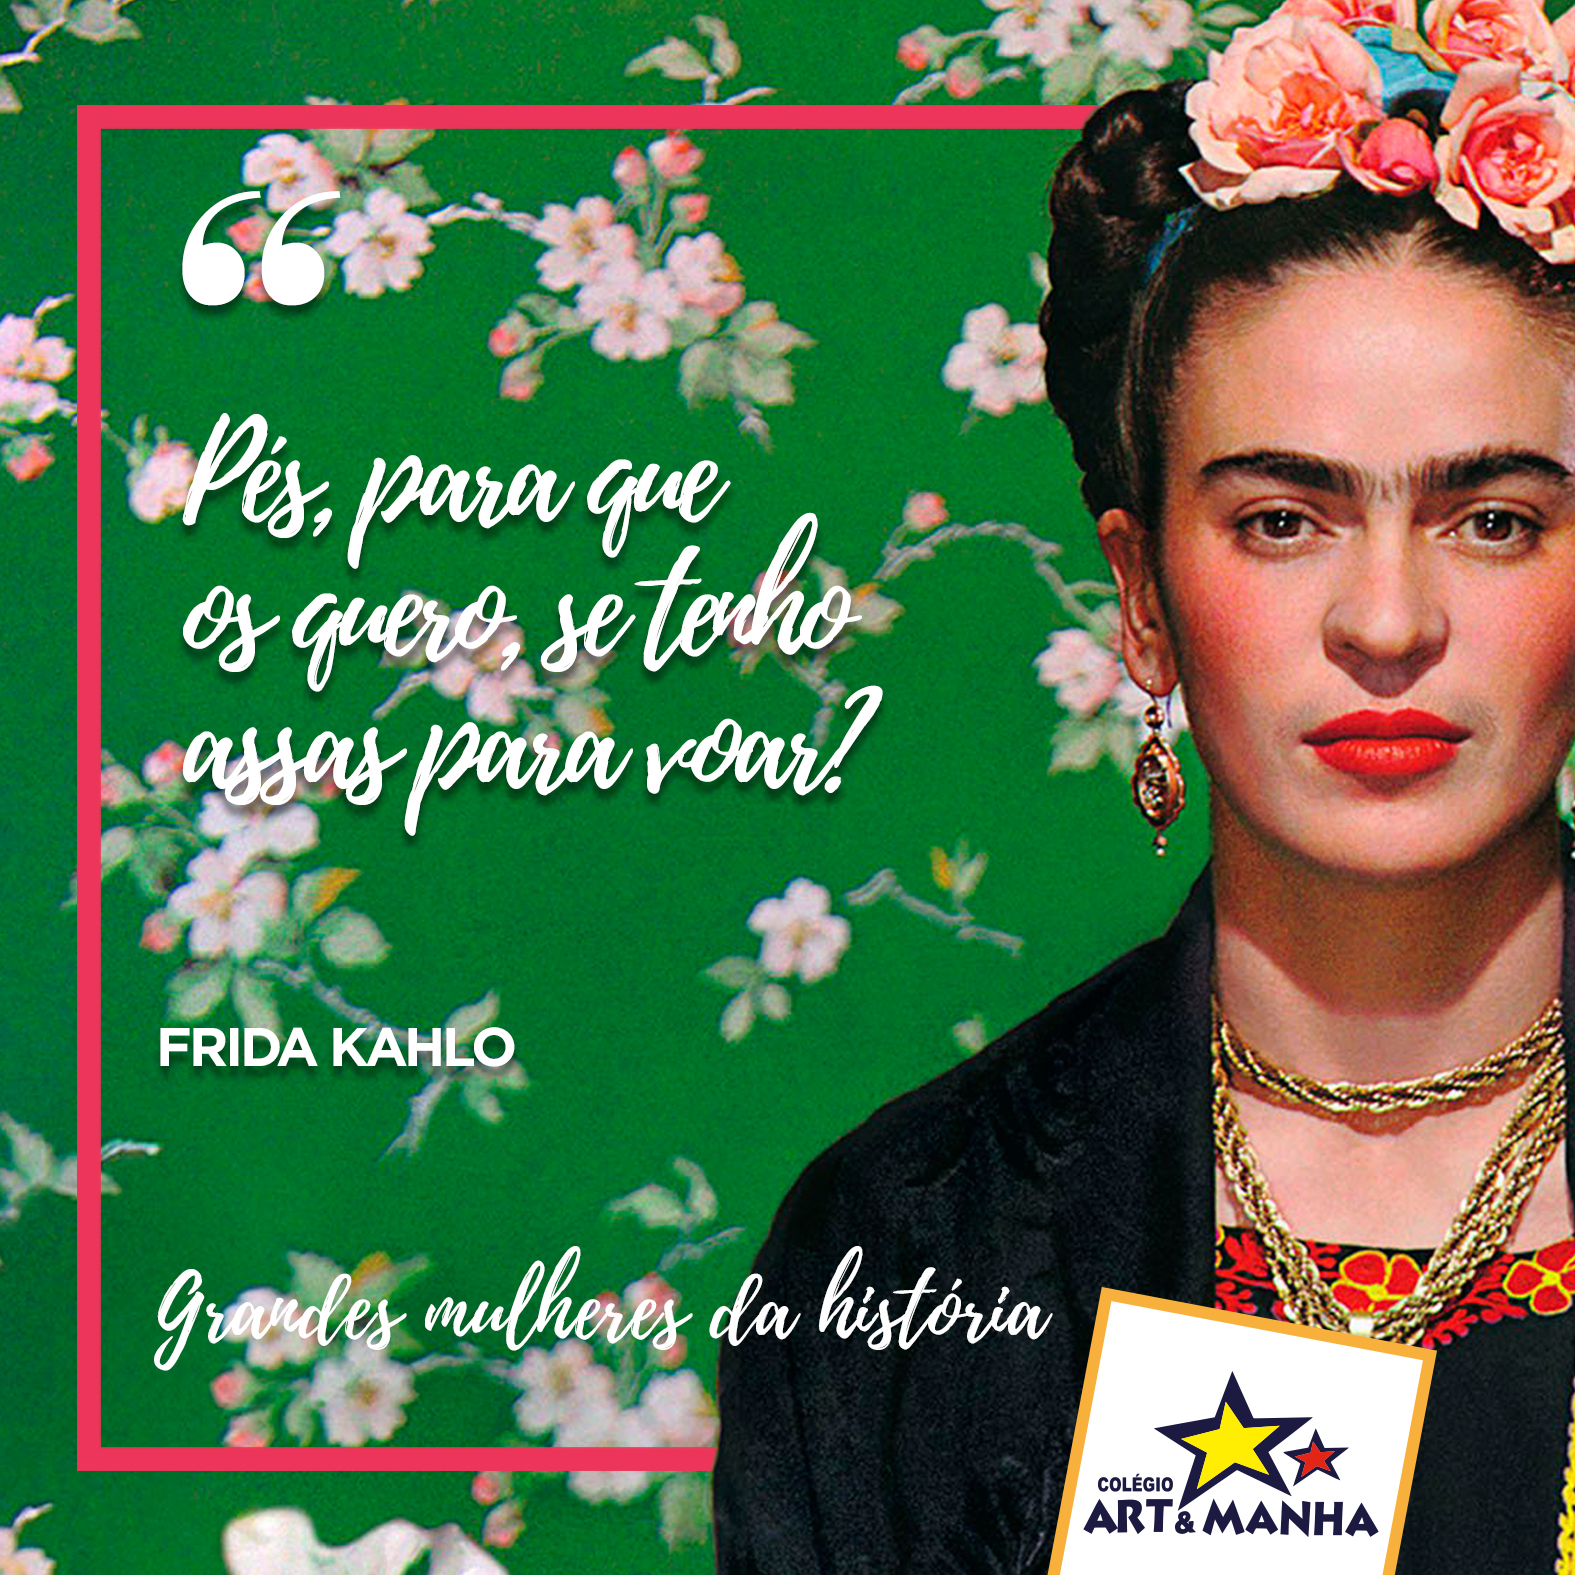 Frida Kahlo - frase dia 2